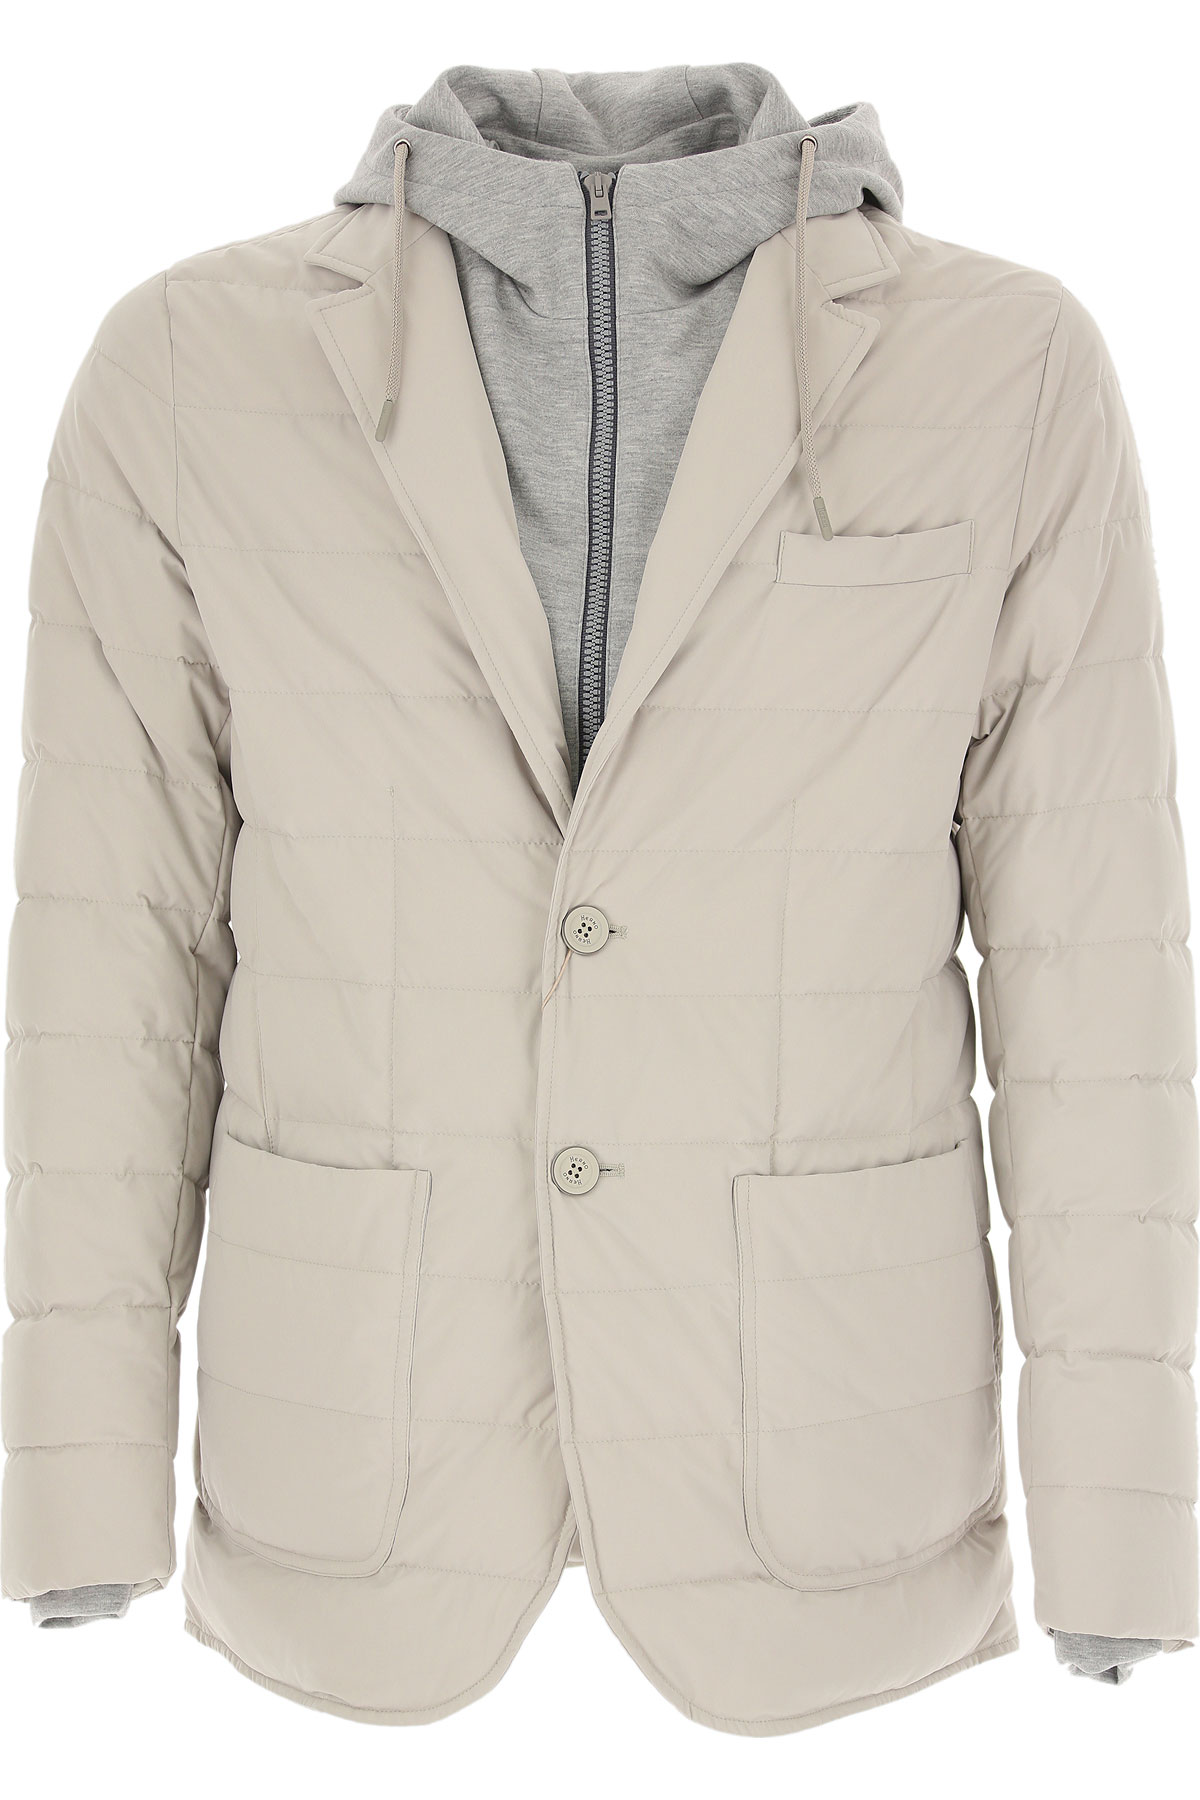 Herno Down Jacket for Men, Puffer Ski Jacket On Sale, Light Grey, polyester, 2019, M XXL